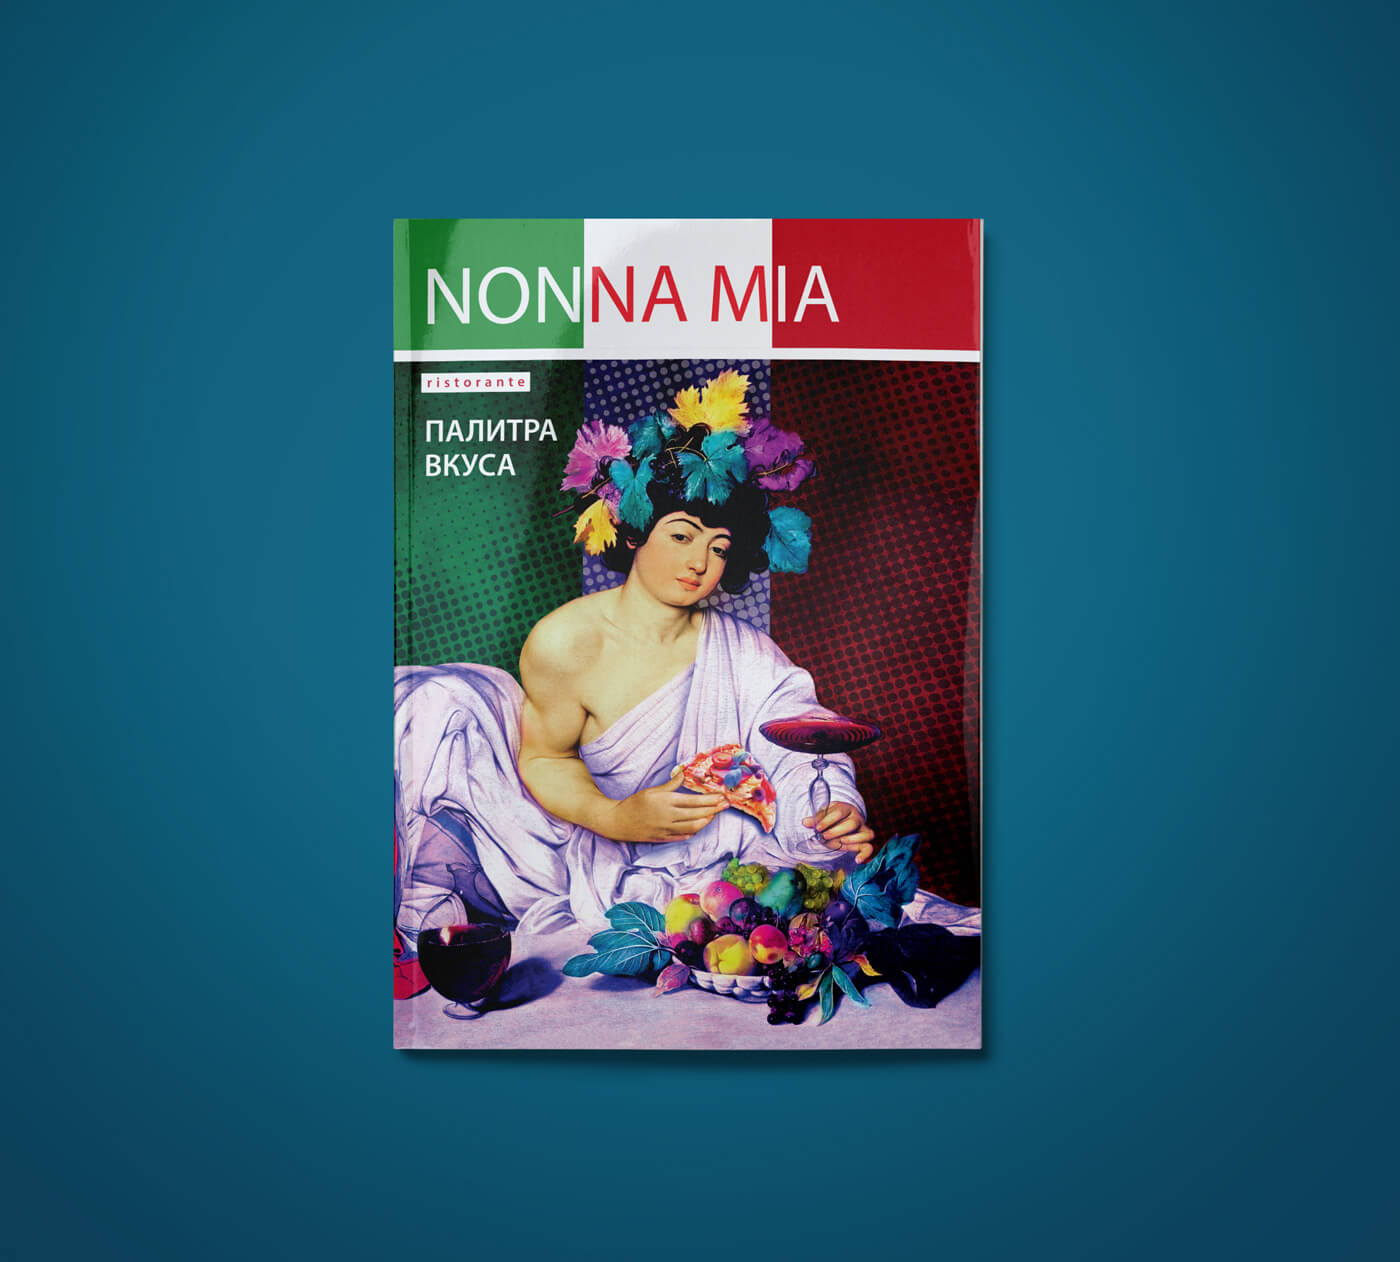 Дизайн обложки меню – Палитра вкуса – Итальянский ресторан «Нонна Миа»